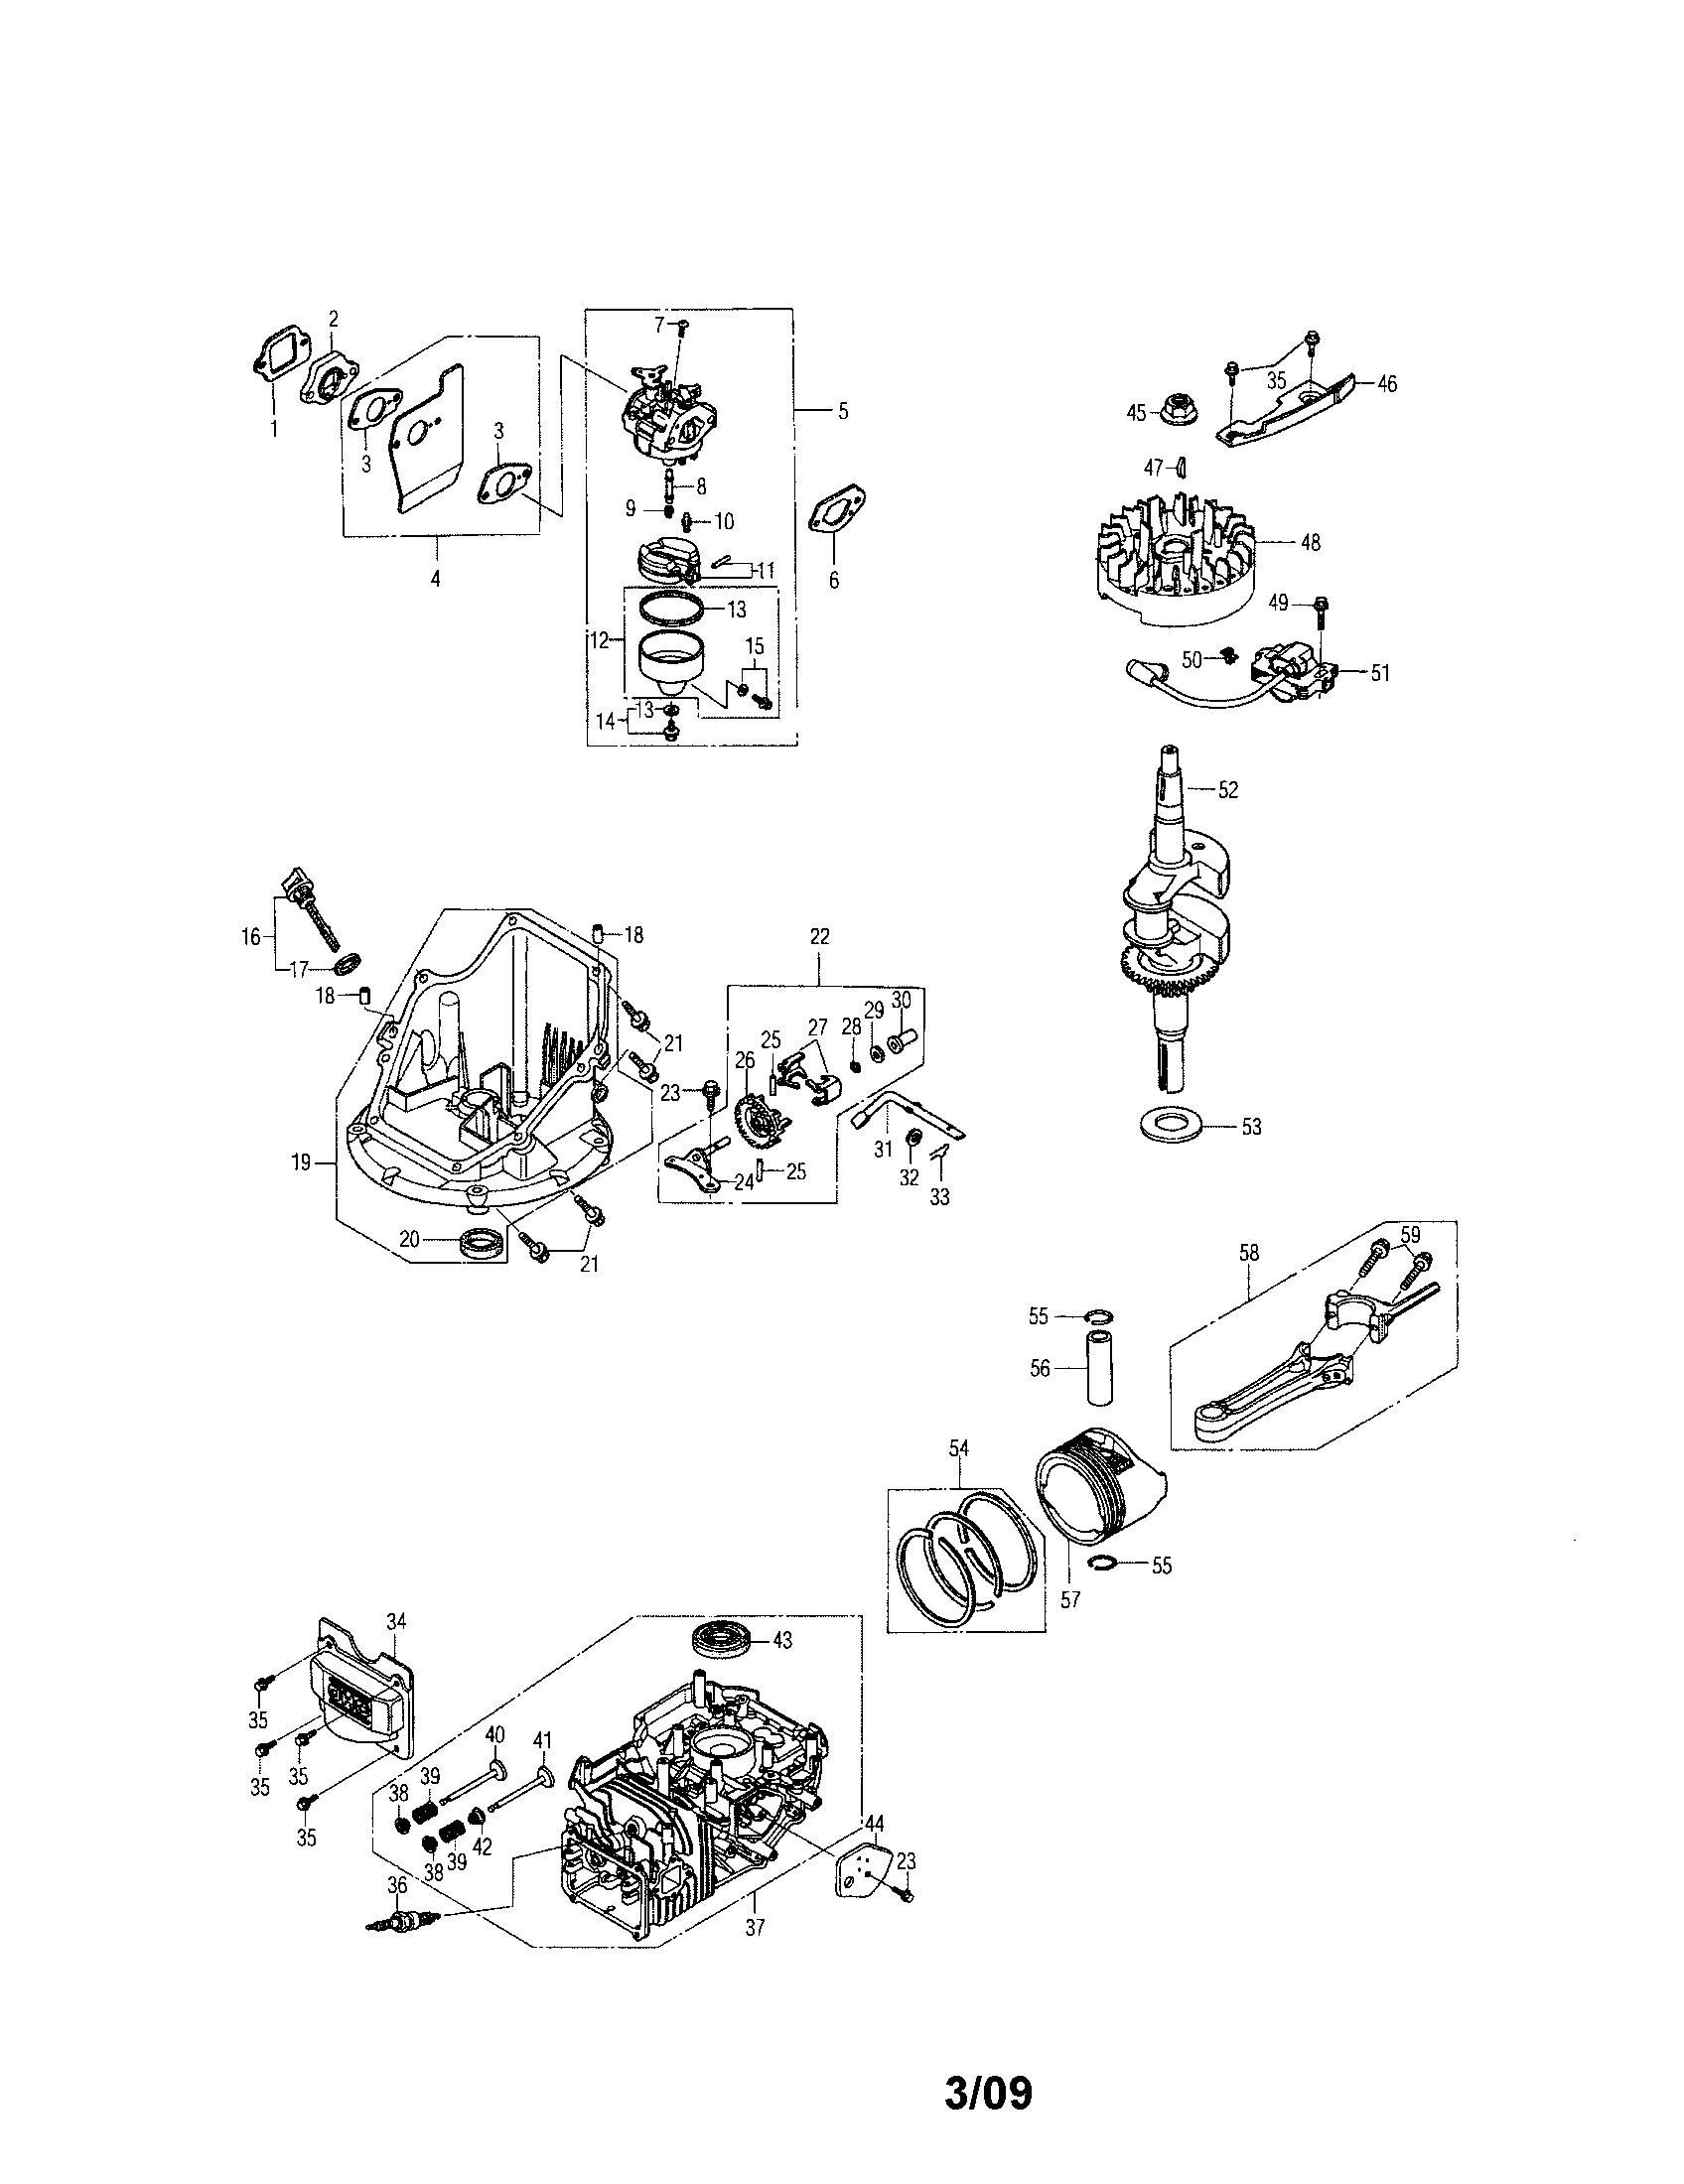 Honda Gc160 Parts Diagram Honda Model Gcv160 Lan5r Engine Genuine Parts Of Honda Gc160 Parts Diagram